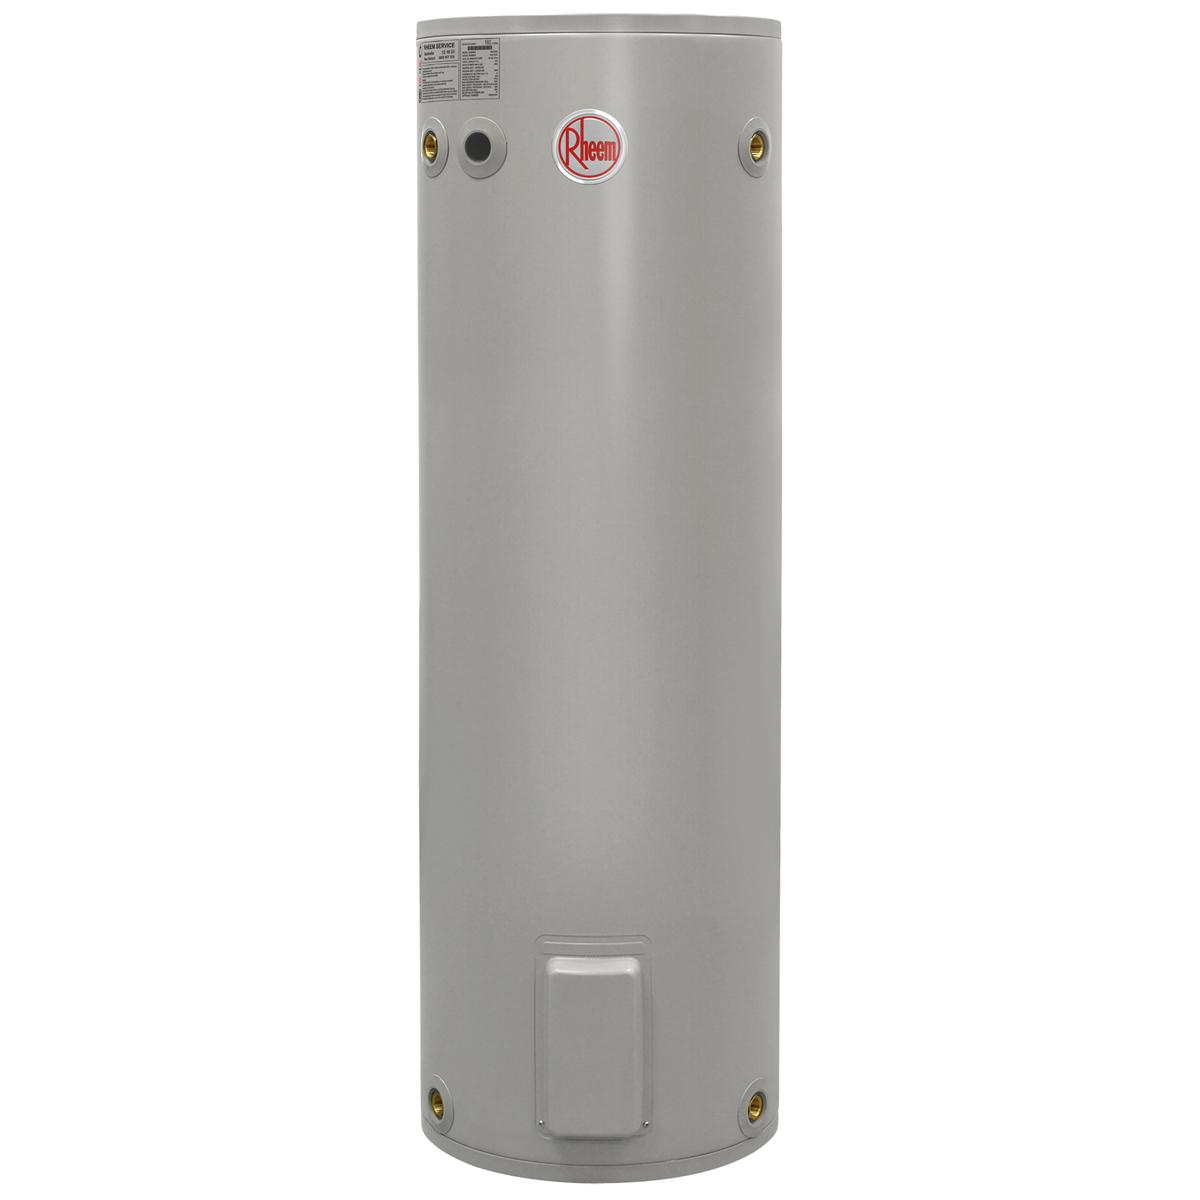 Rheem-Electric-160L-SE-491160-1200px